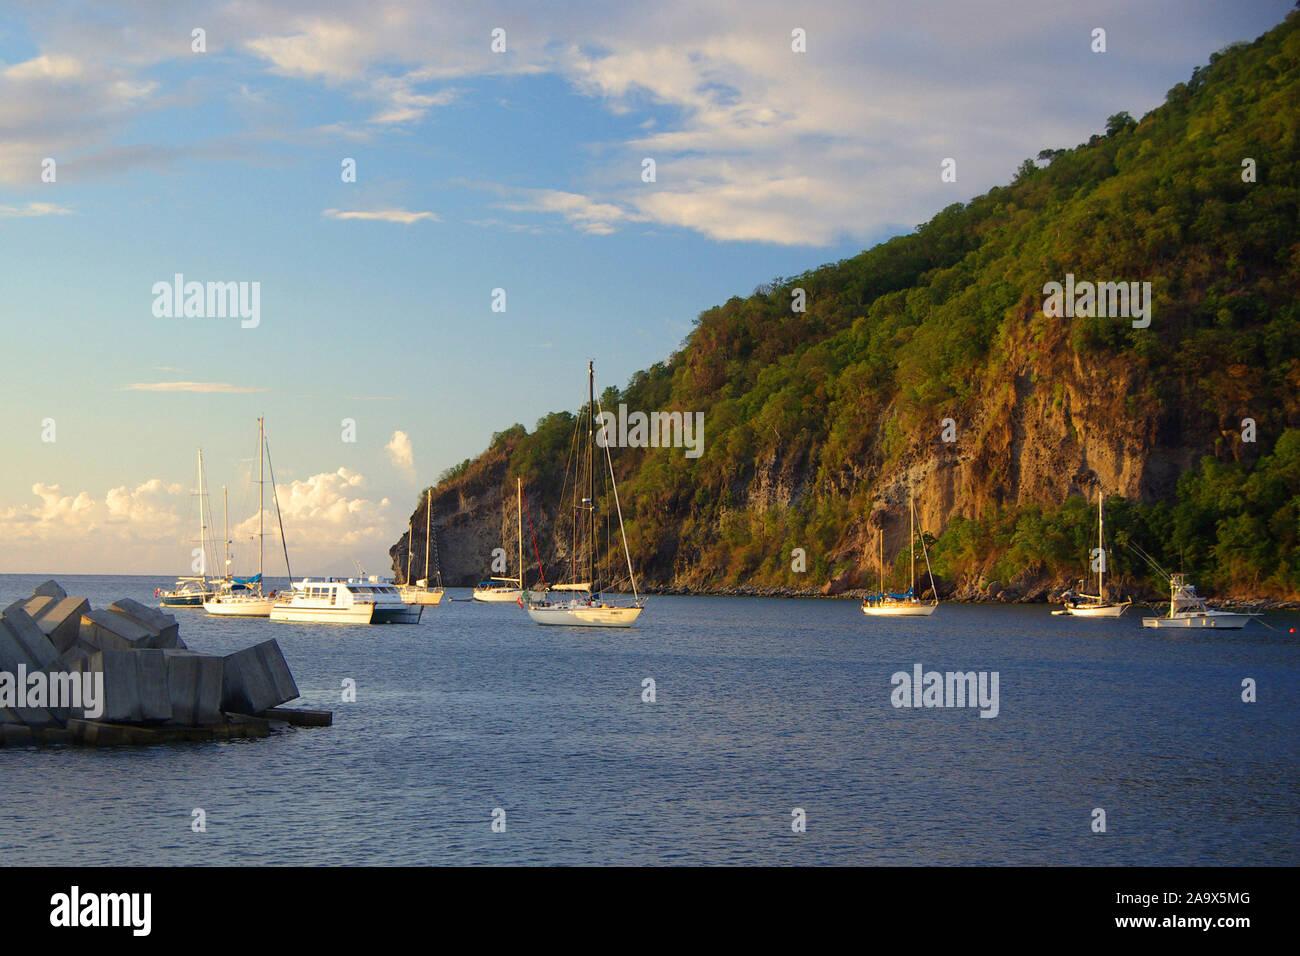 Franzoesiche Karibik; Antillen; Guadeloupe; Banque D'Images